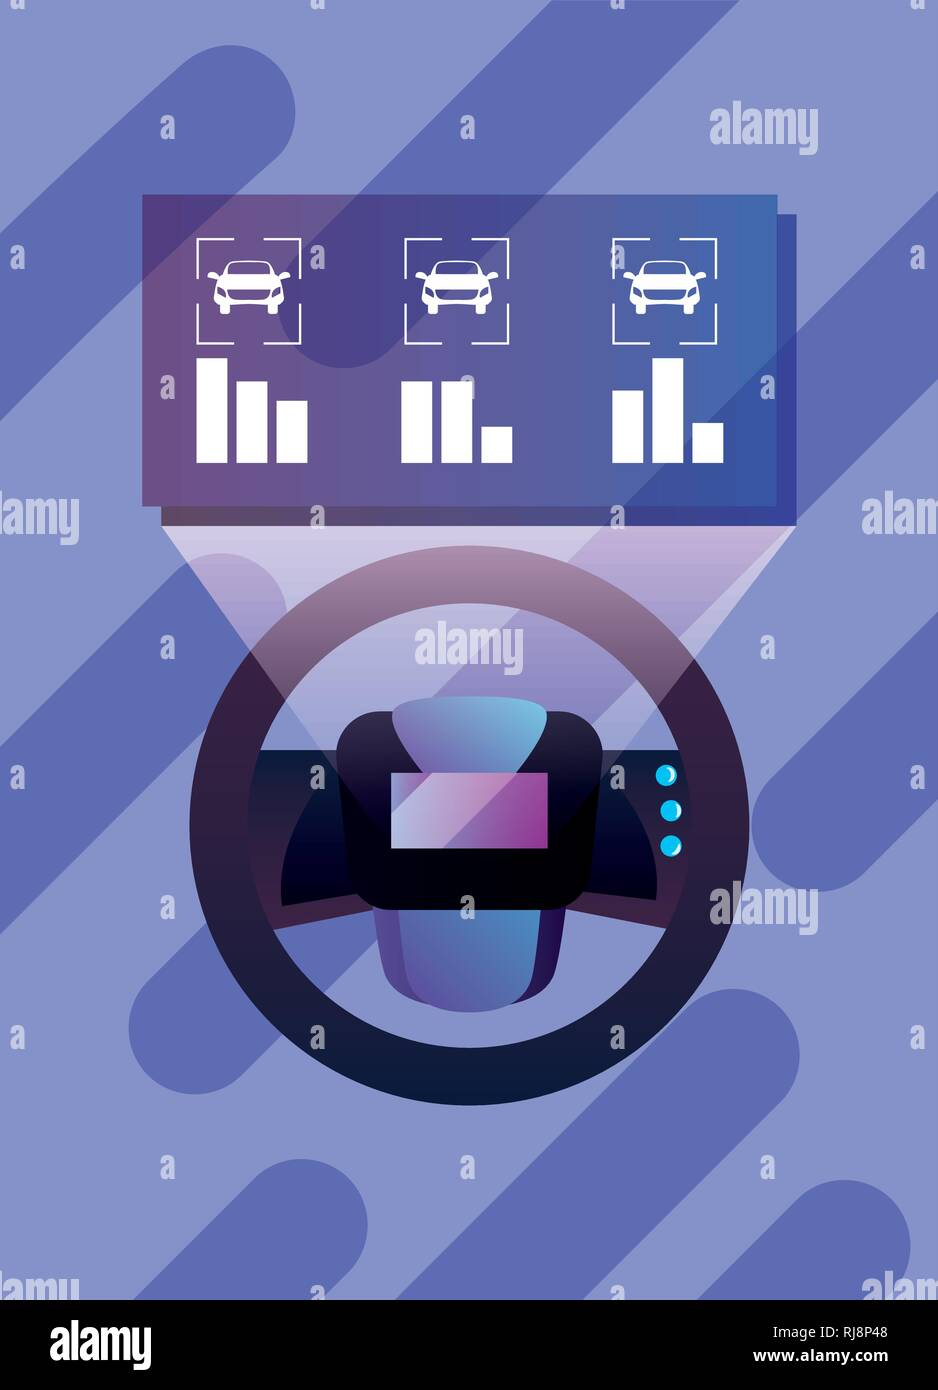 hight resolution of autonomous smart car steering wheel diagram vector illustration